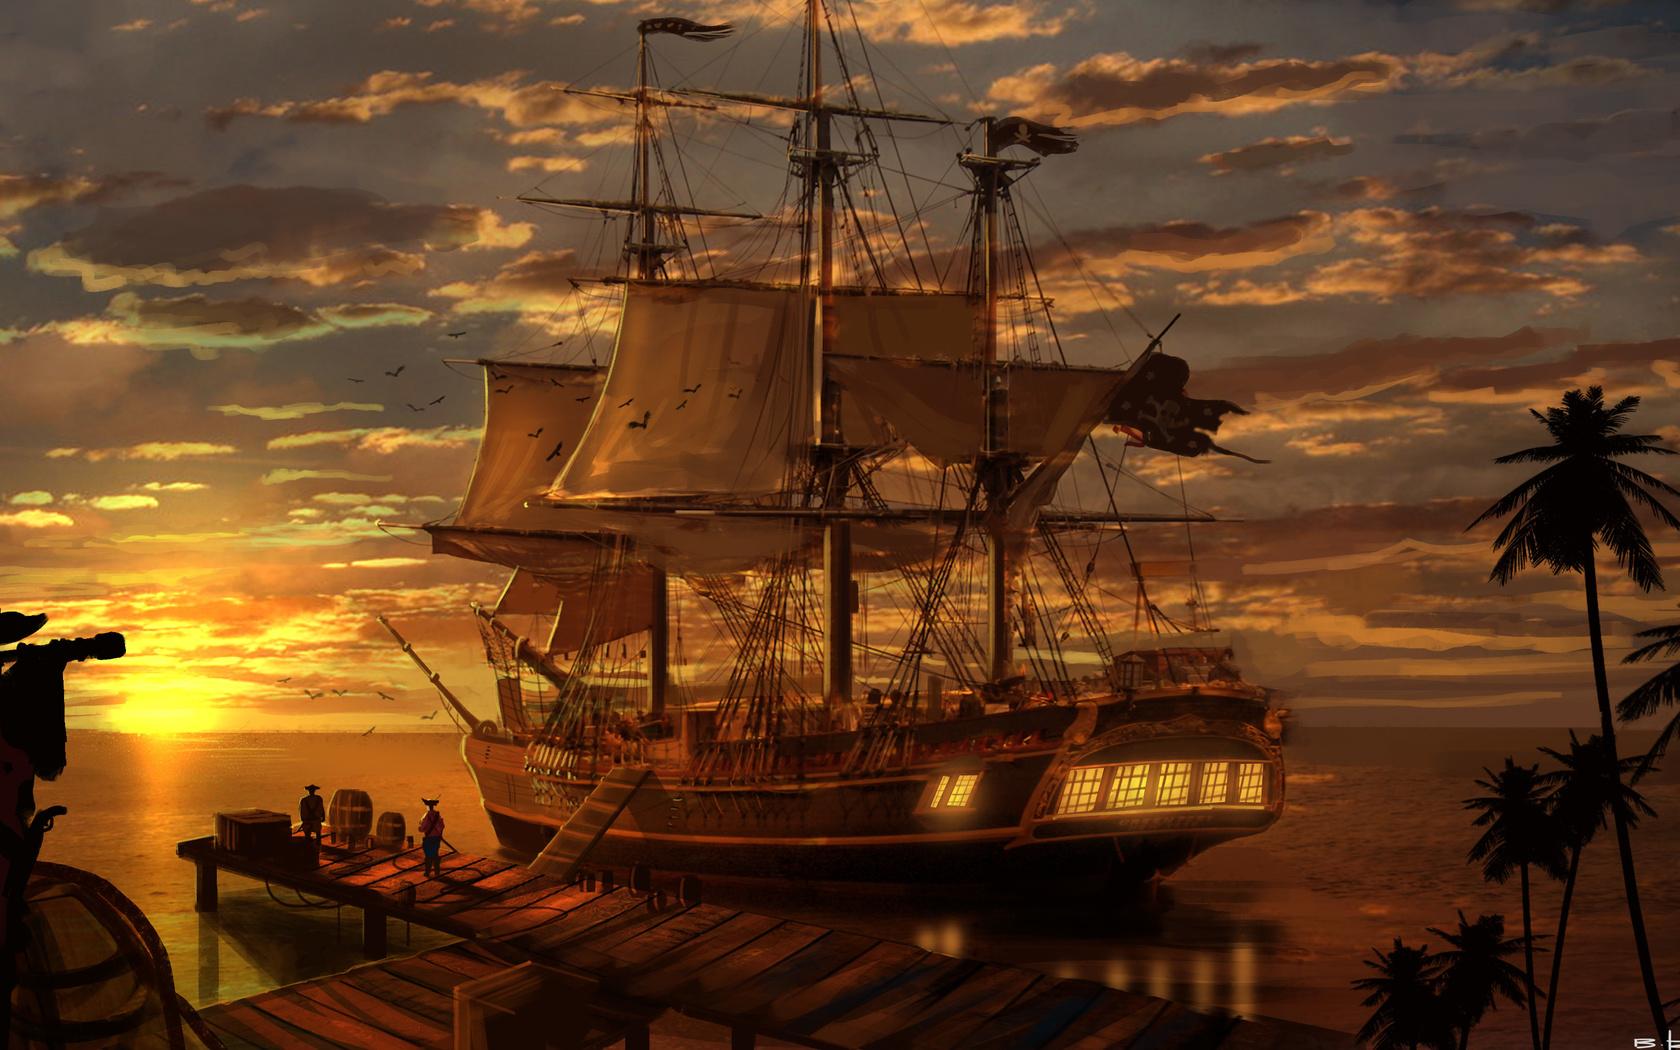 пираты, океан, порт, снабжение, закат, пальмы, облака, солнце, небо,